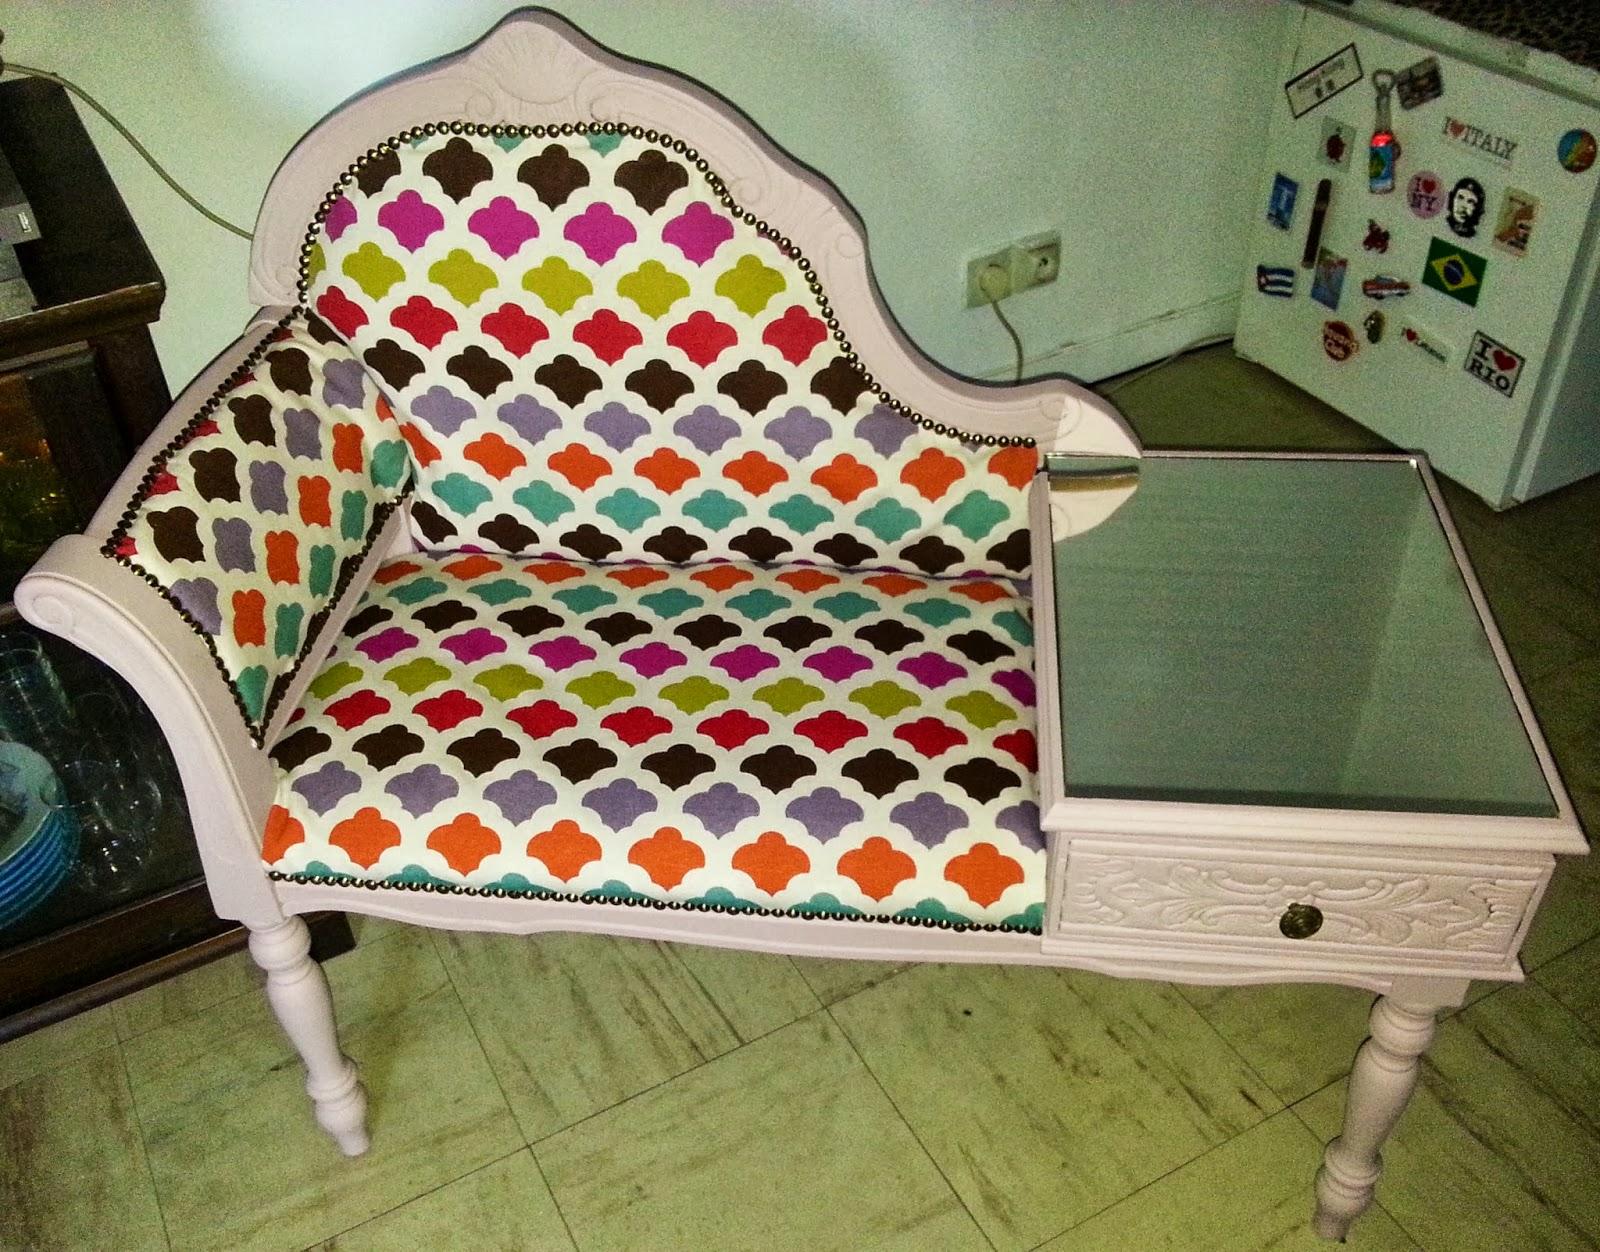 passionalys banquette telephone. Black Bedroom Furniture Sets. Home Design Ideas